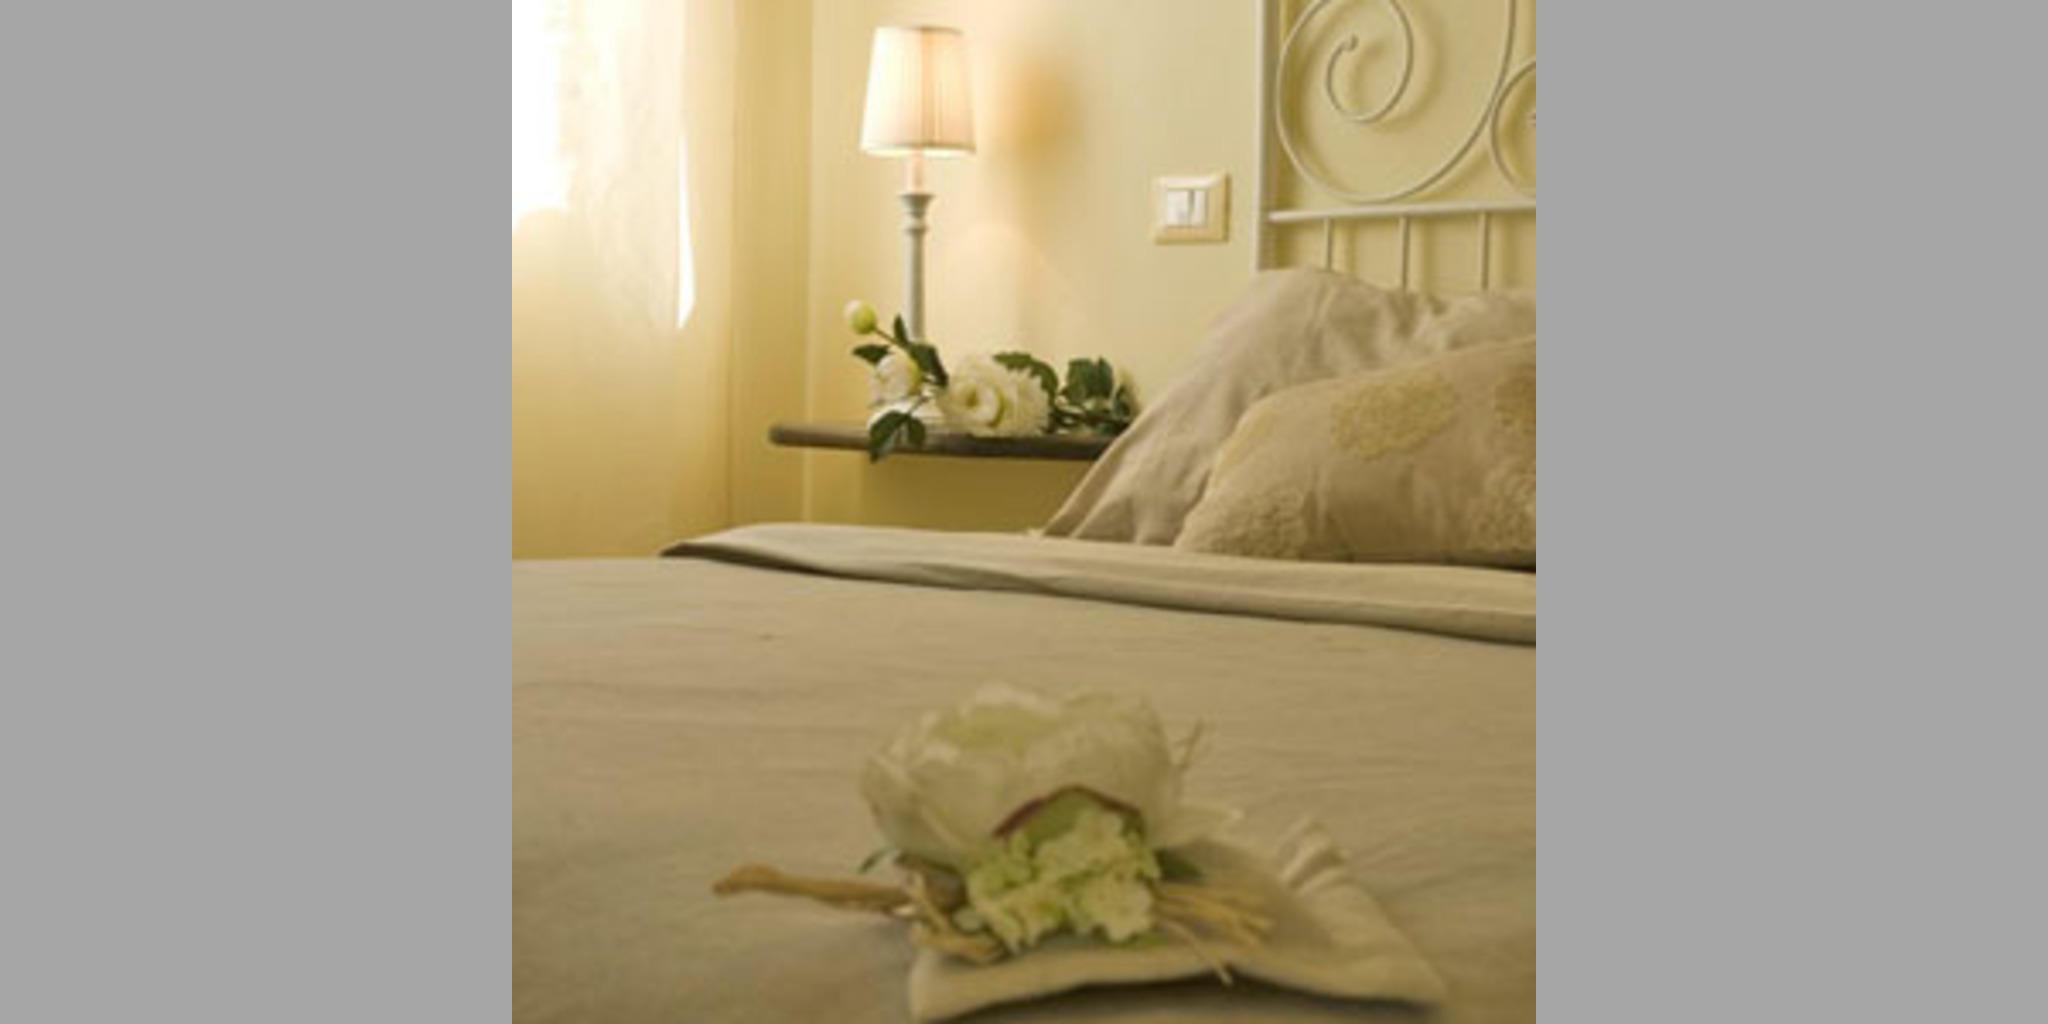 Bed & Breakfast Barberino Val D'Elsa - Chianti  Barberino Val D'elsa